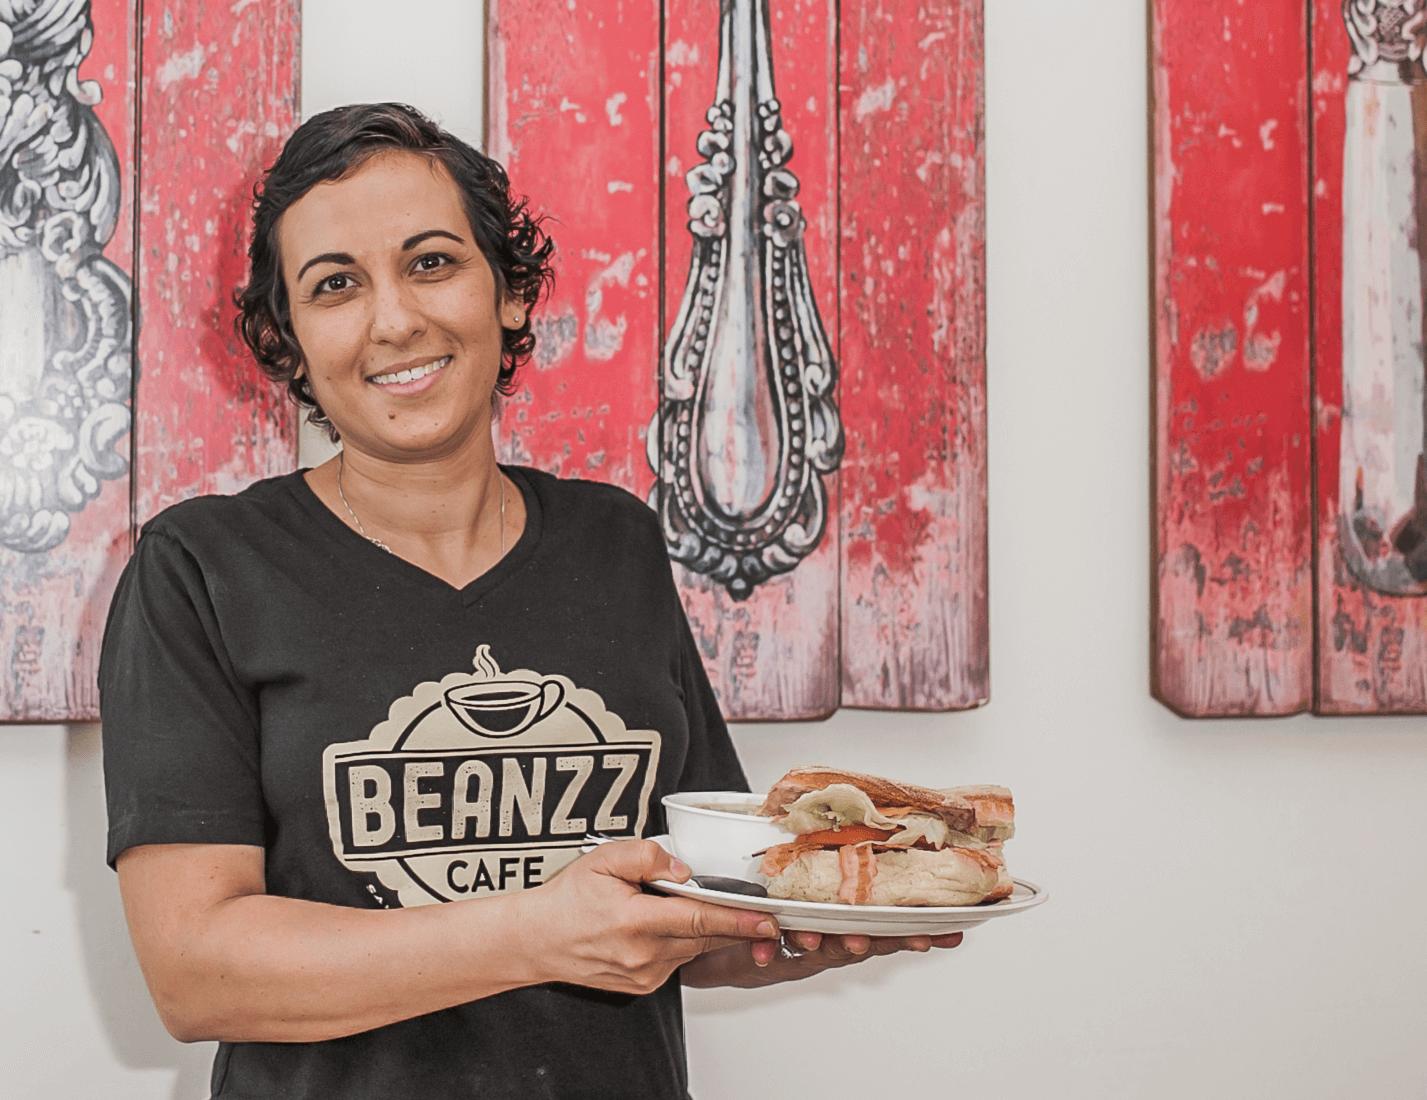 cafe owner holding sandwich